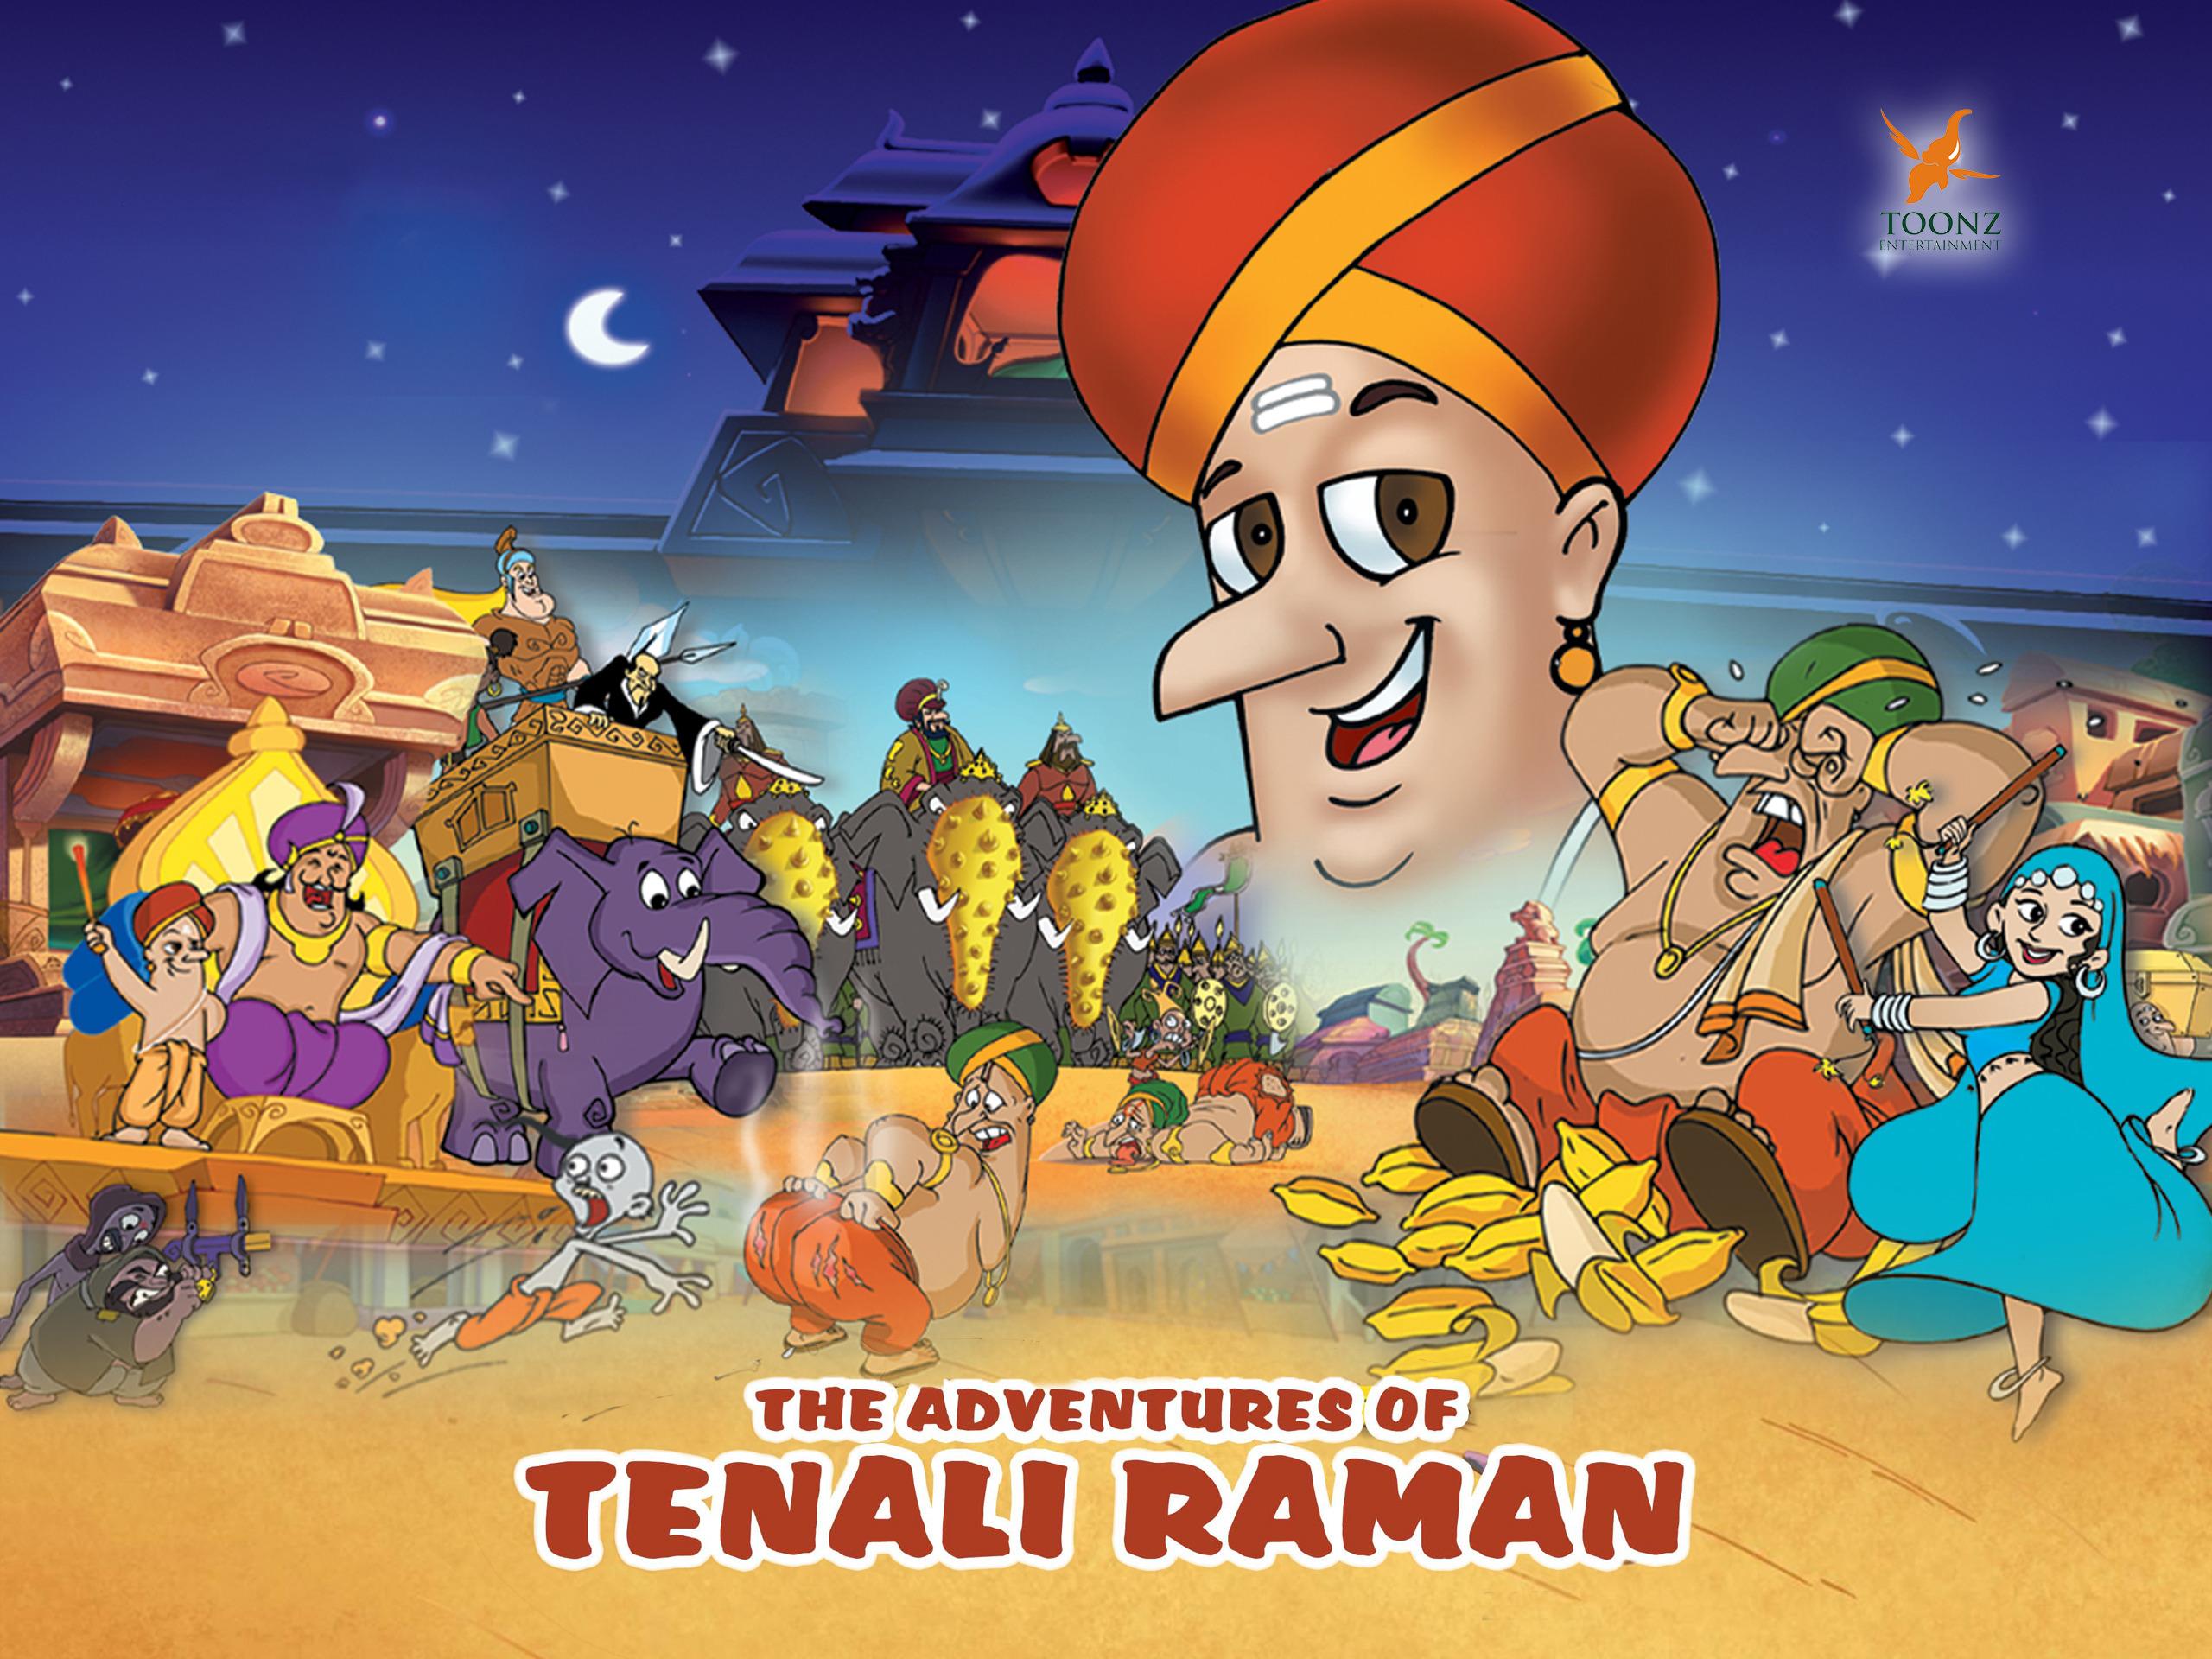 Prime Video: The Adventures of Tenali Raman - Season 01